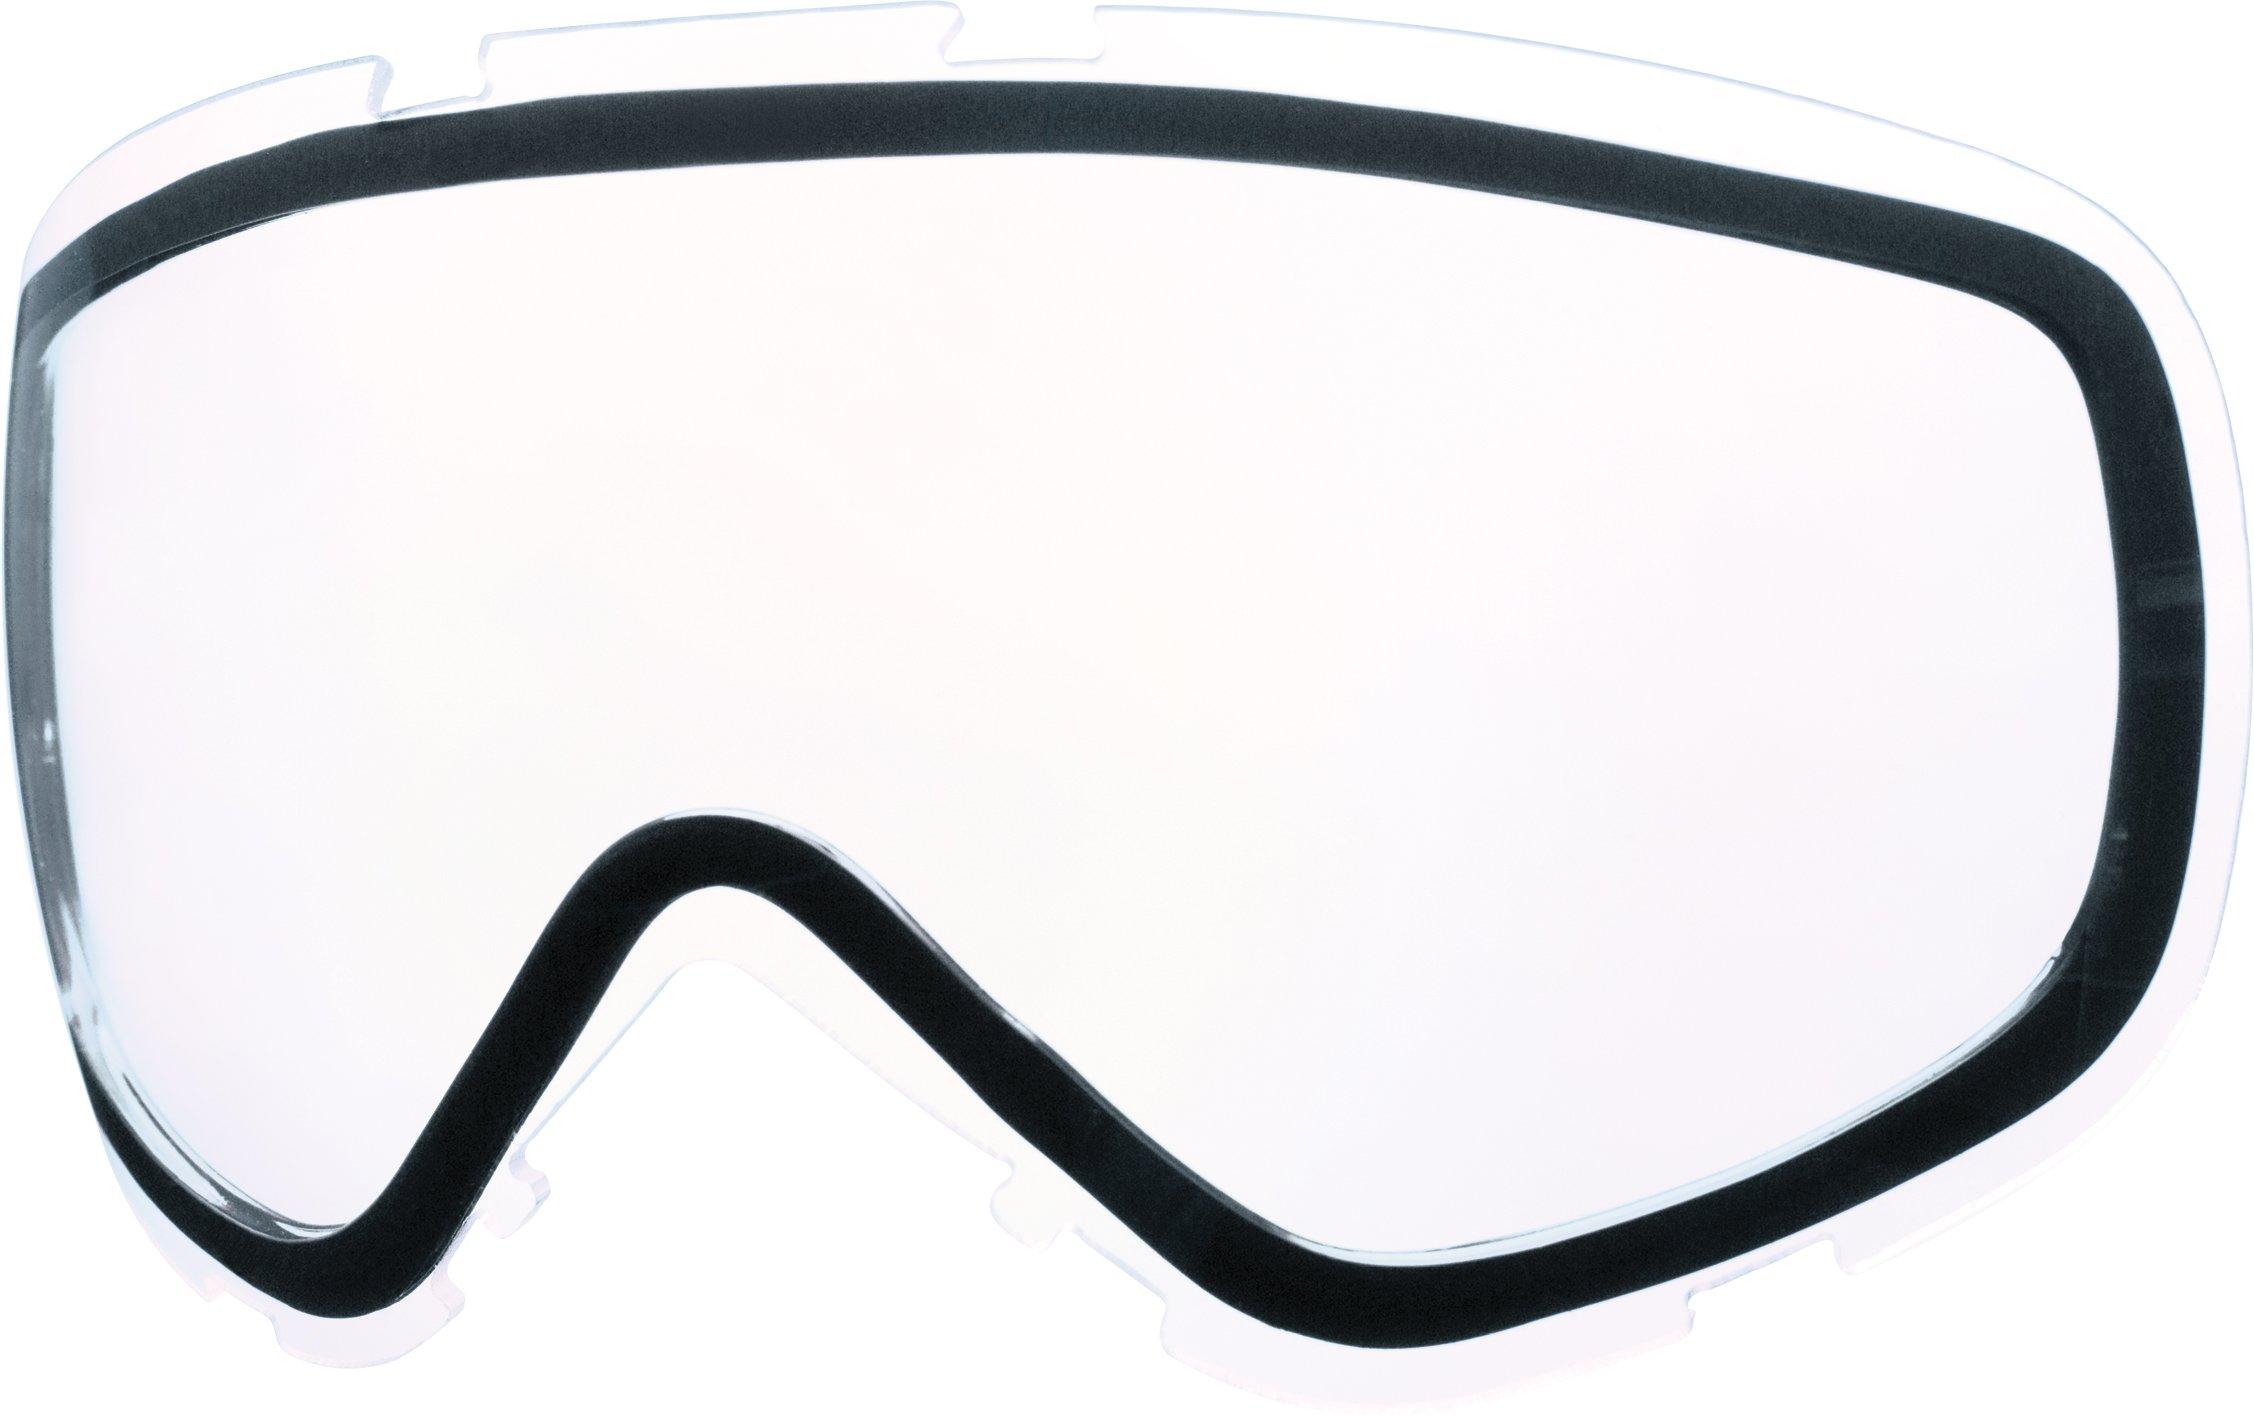 Smith Goggle Lens Color Tint Guide Evo